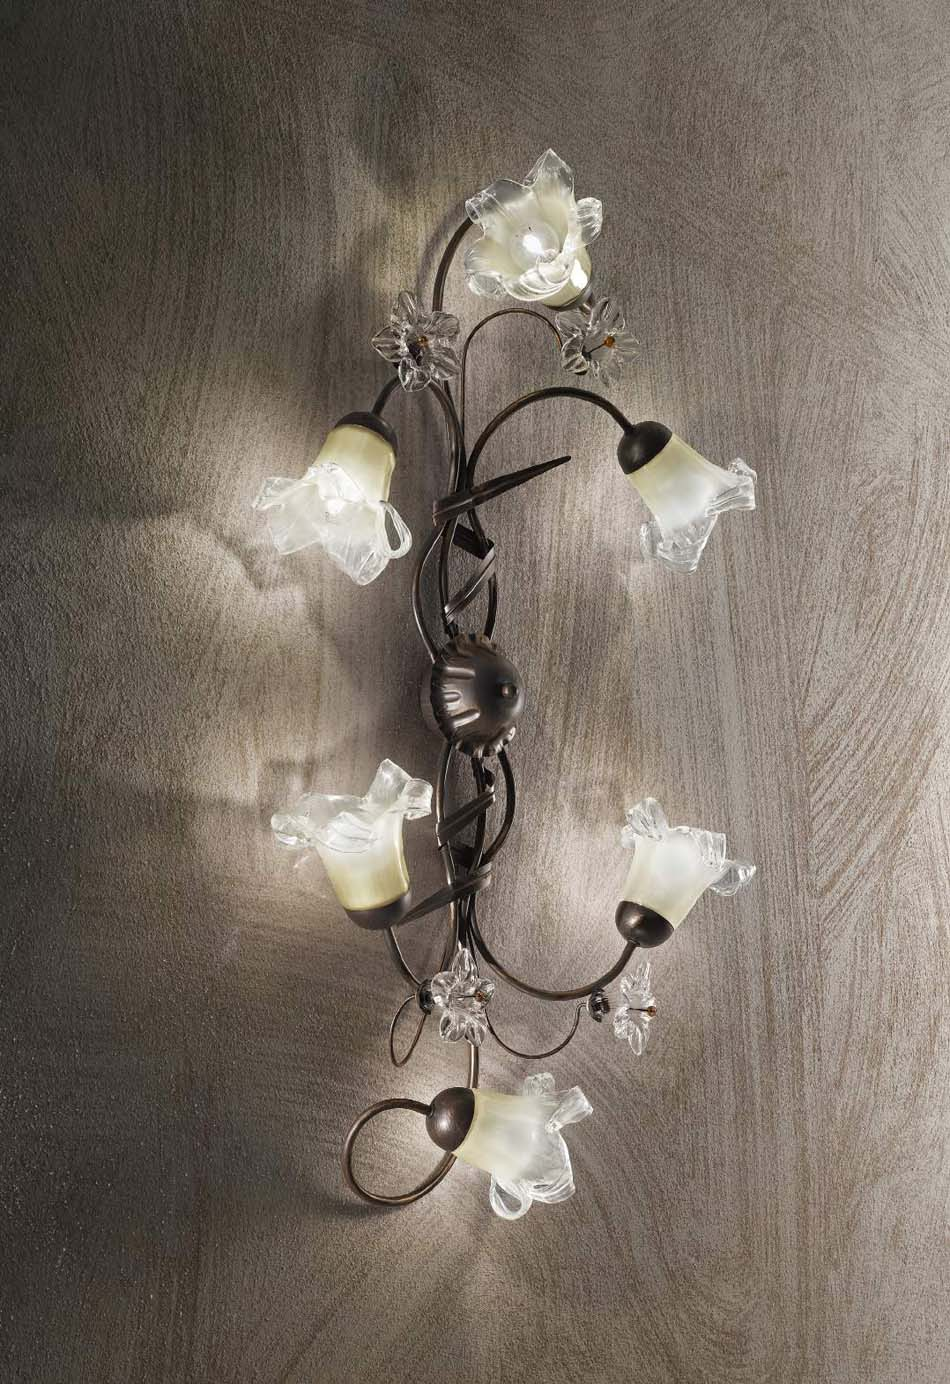 Lampade 56 sospese vintage Ideal Lux Tirol – Toscana Arredamenti